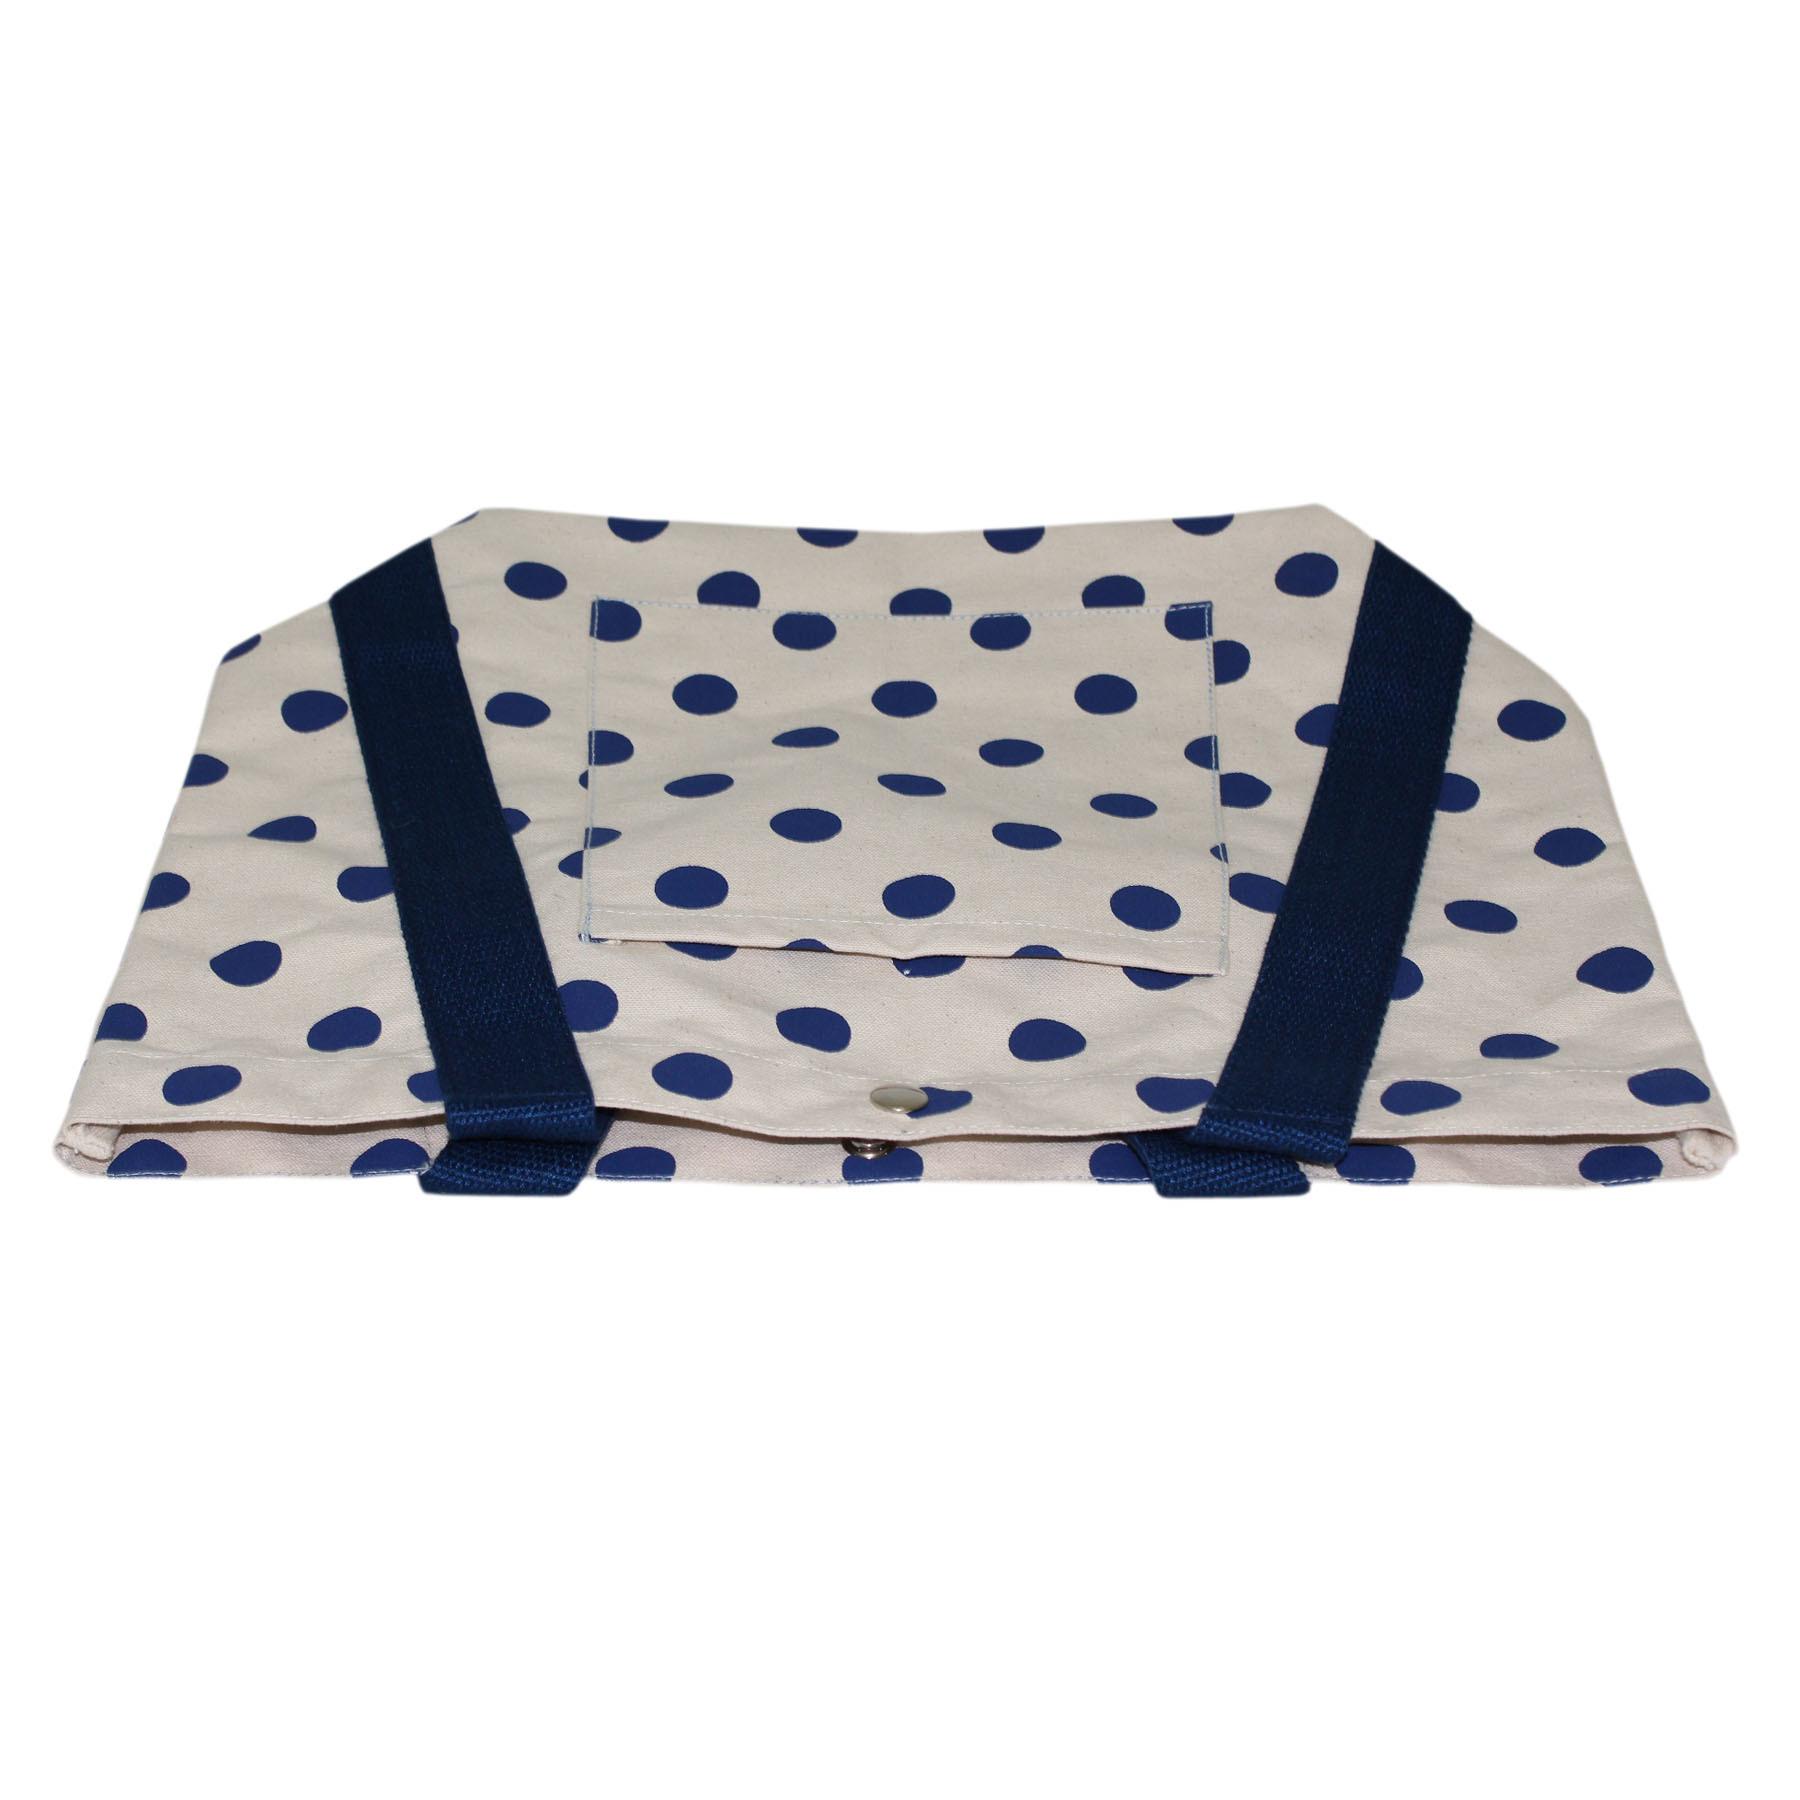 Cotton Web Handle Polka Dot Print 12 Oz Natural Canvas Designer Tote Bag